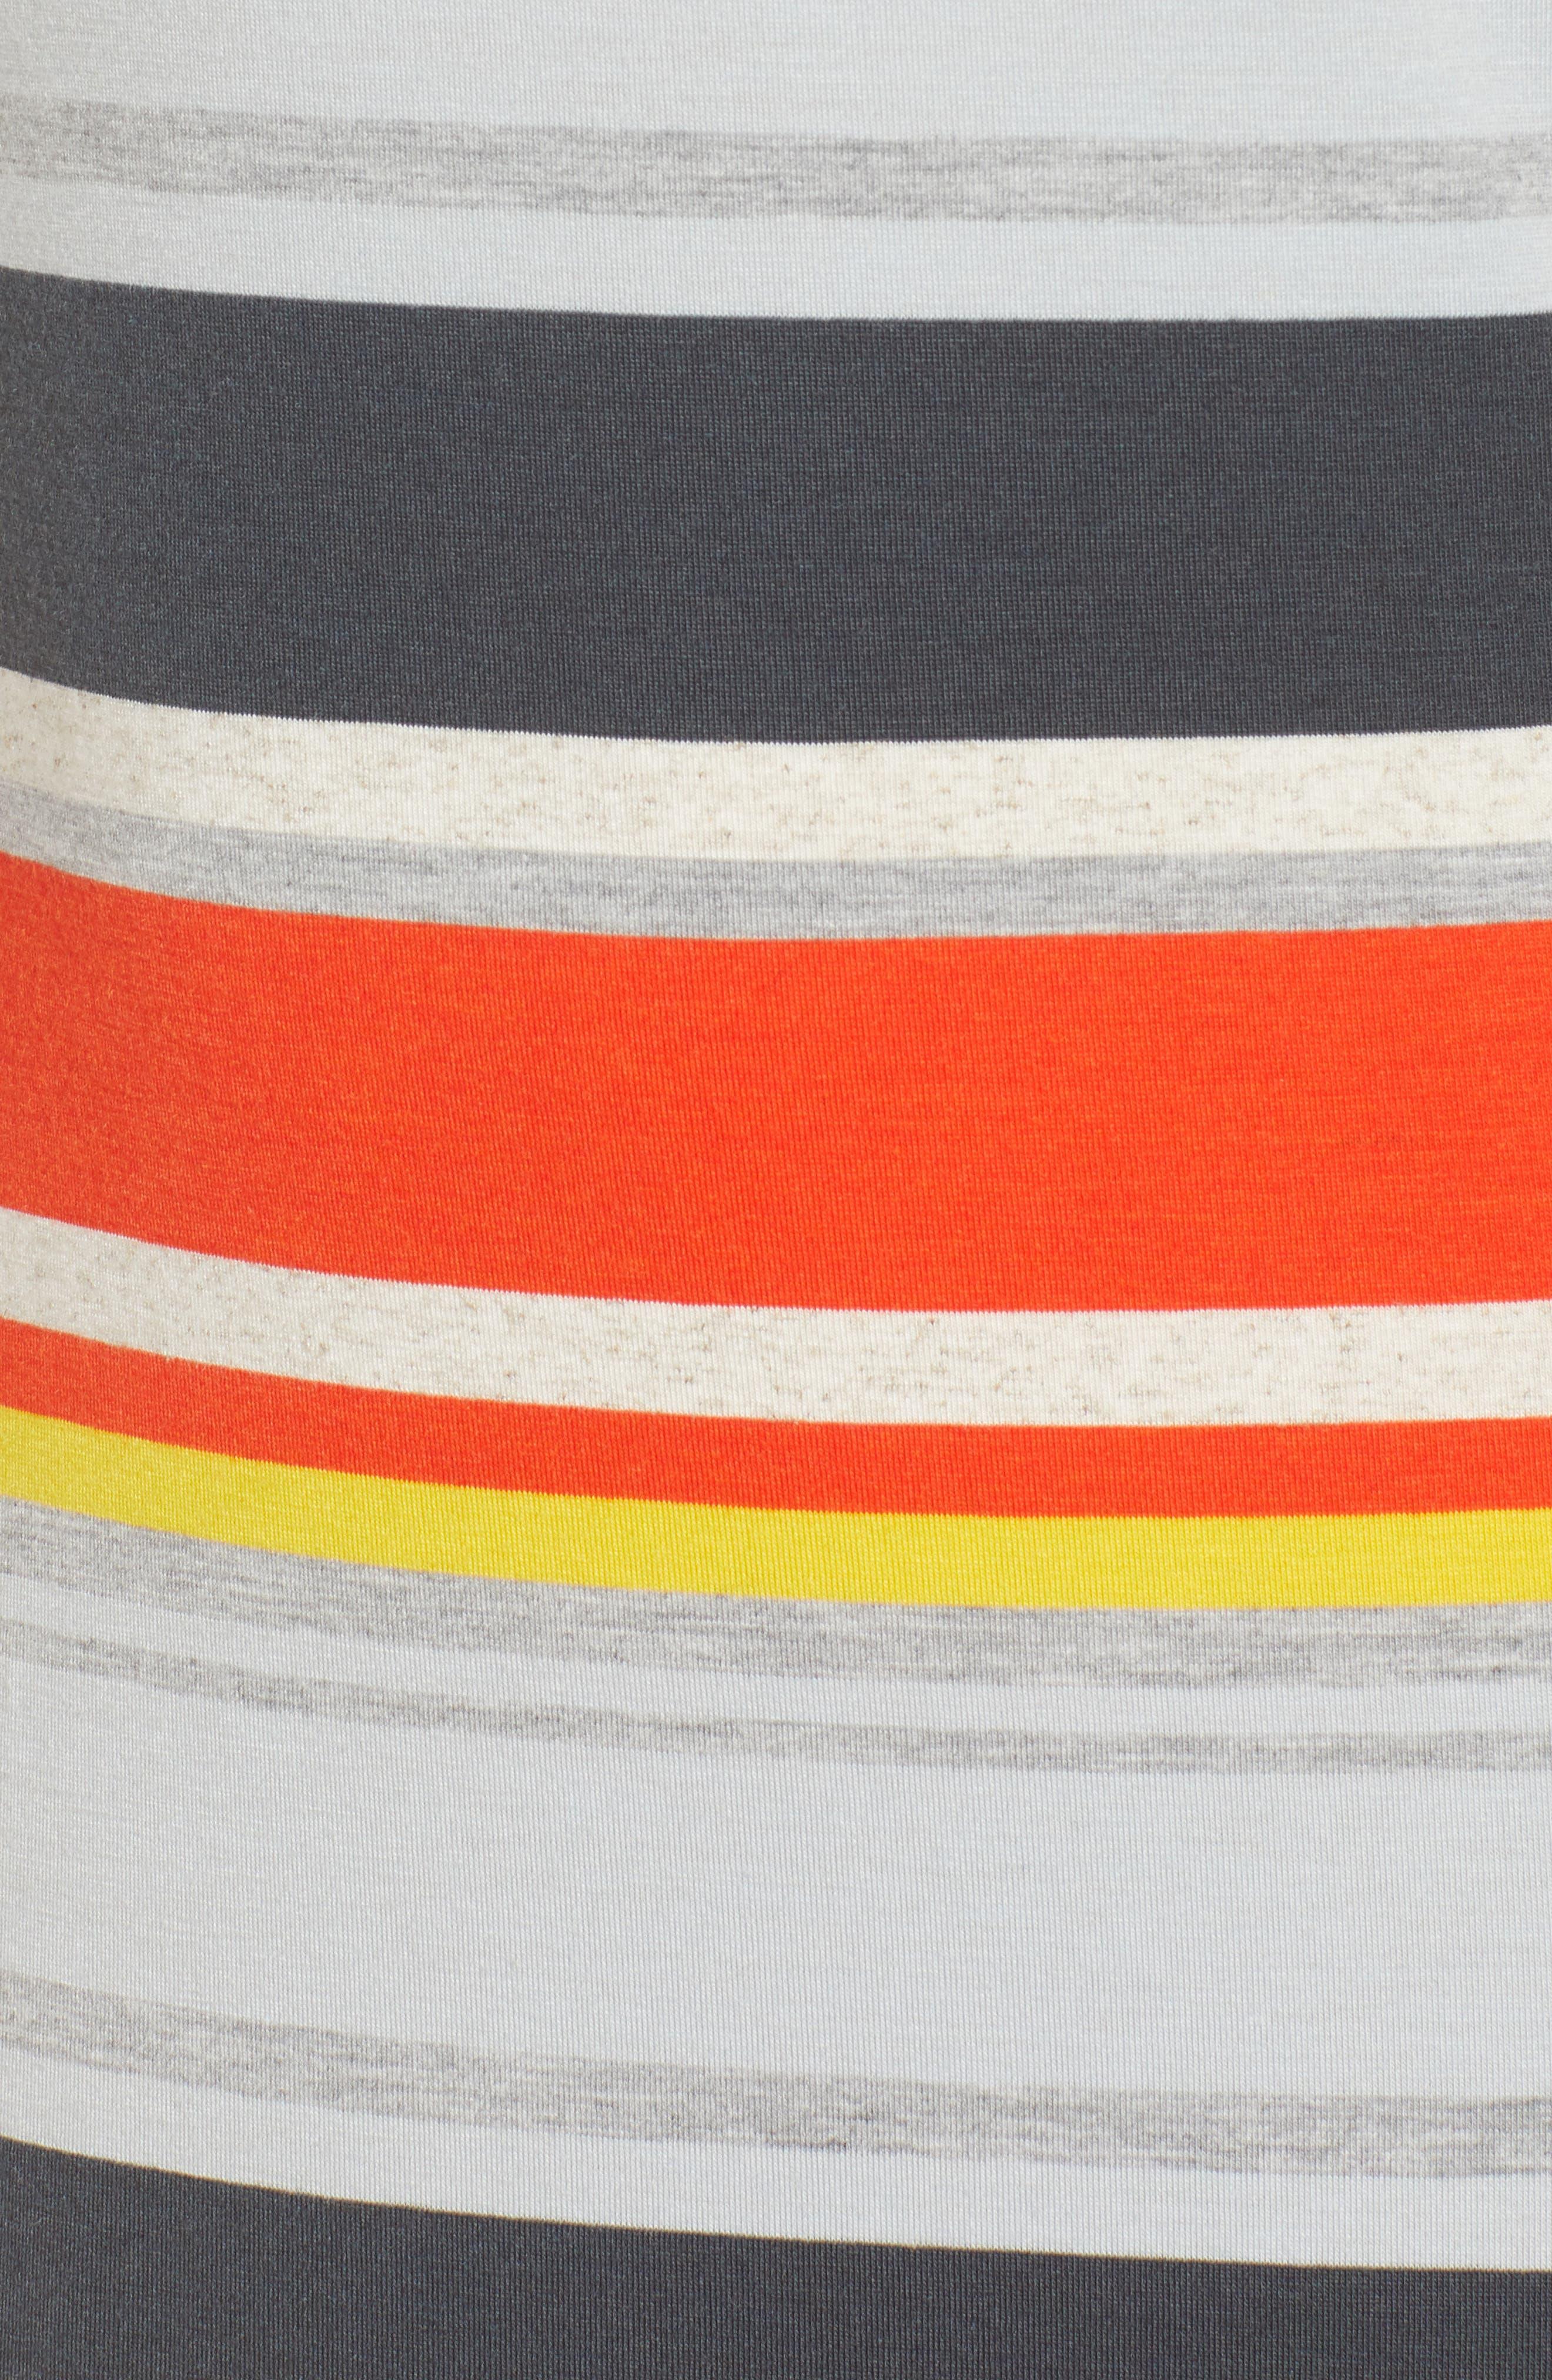 Stripe Midi Dress,                             Alternate thumbnail 6, color,                             Orange Multi